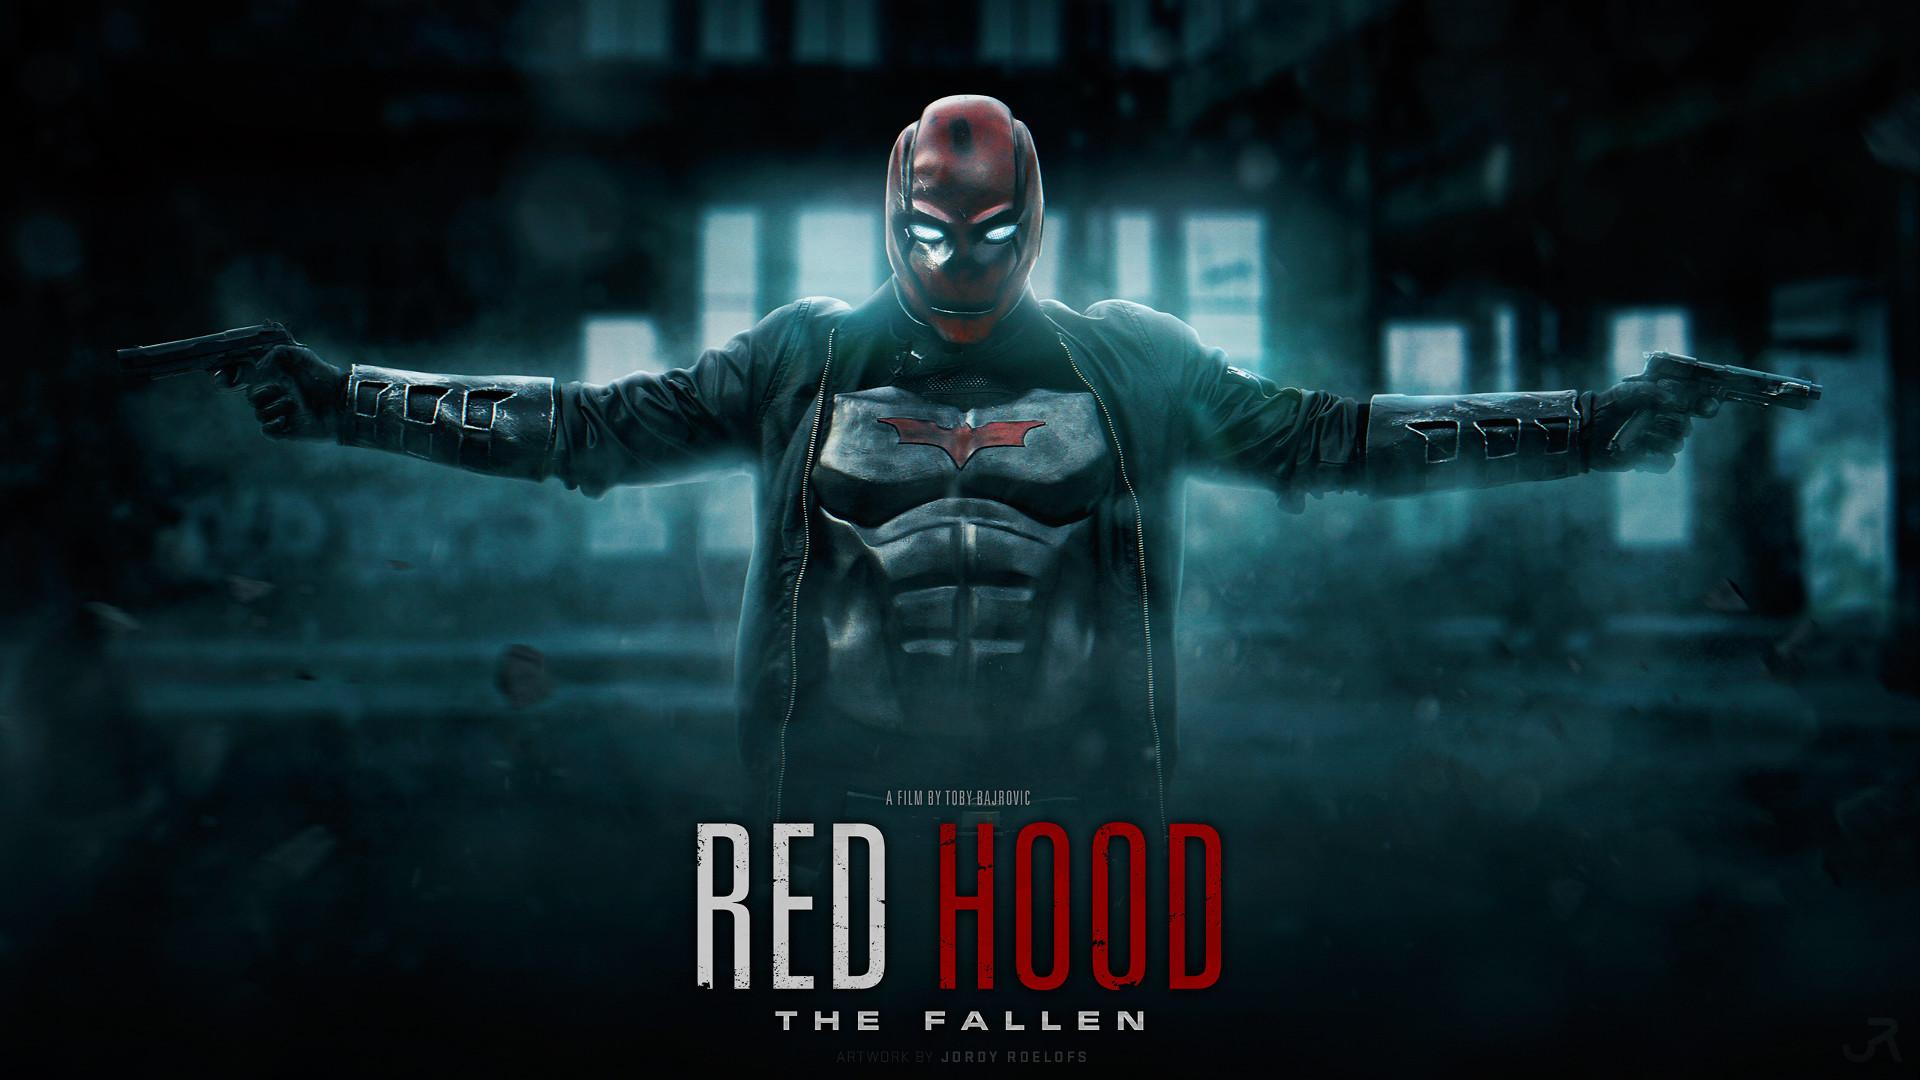 Jason Todd Red Hood Batman Arkham Knight wallpapers (61 Wallpapers) – HD  Wallpapers